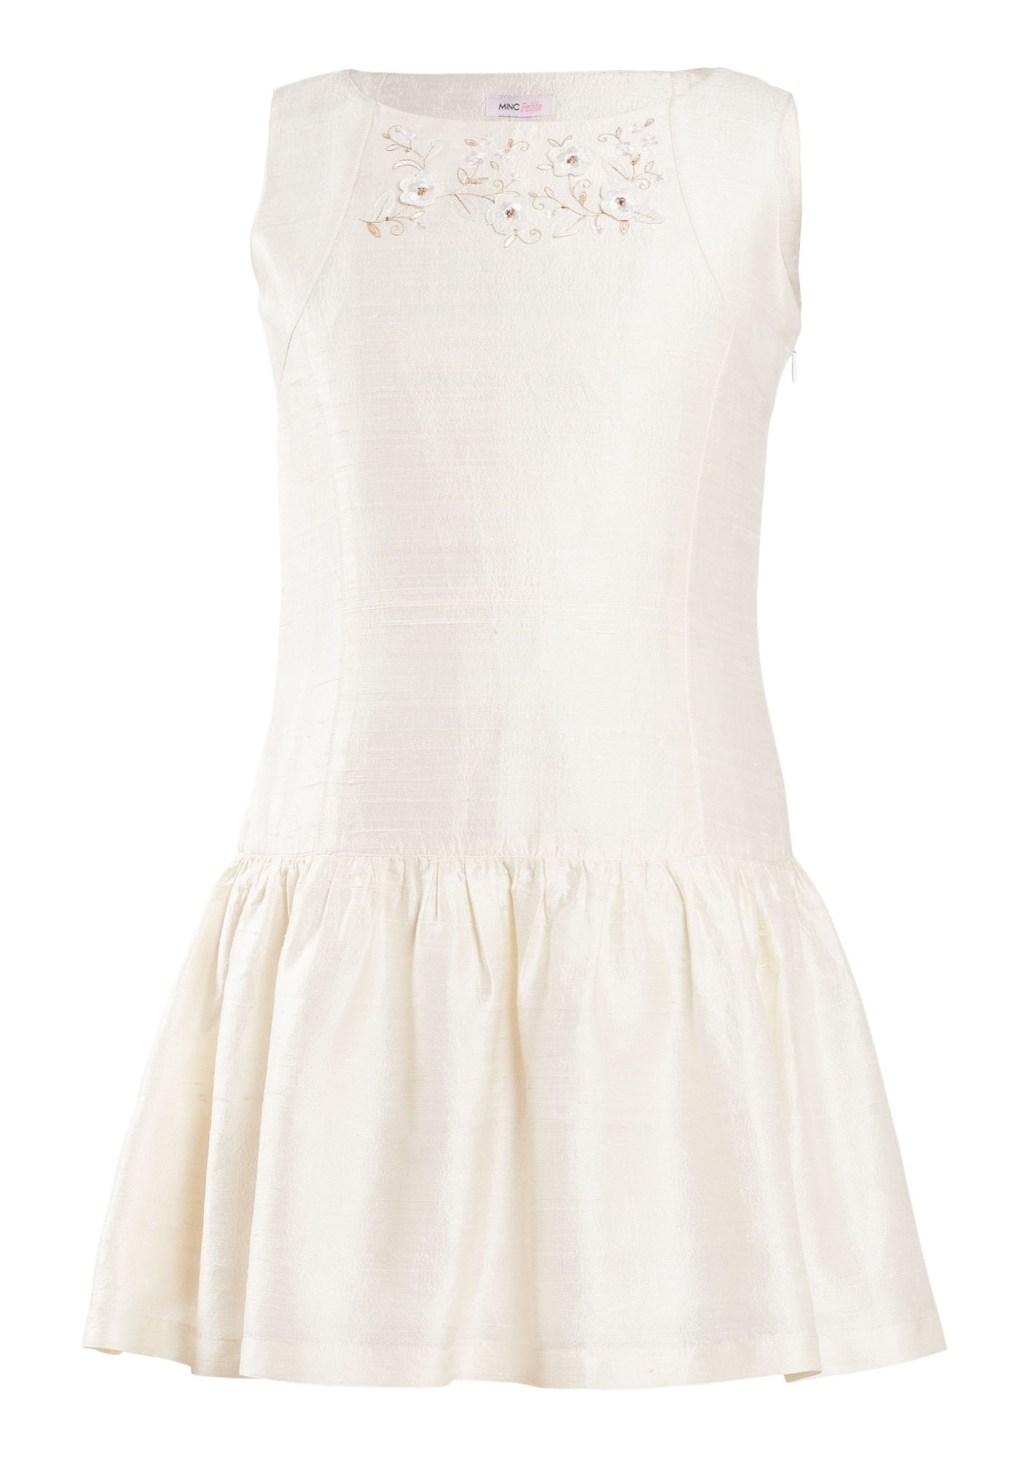 MINC Petite Girls Sleeveless Embroidered Dress in White Silk